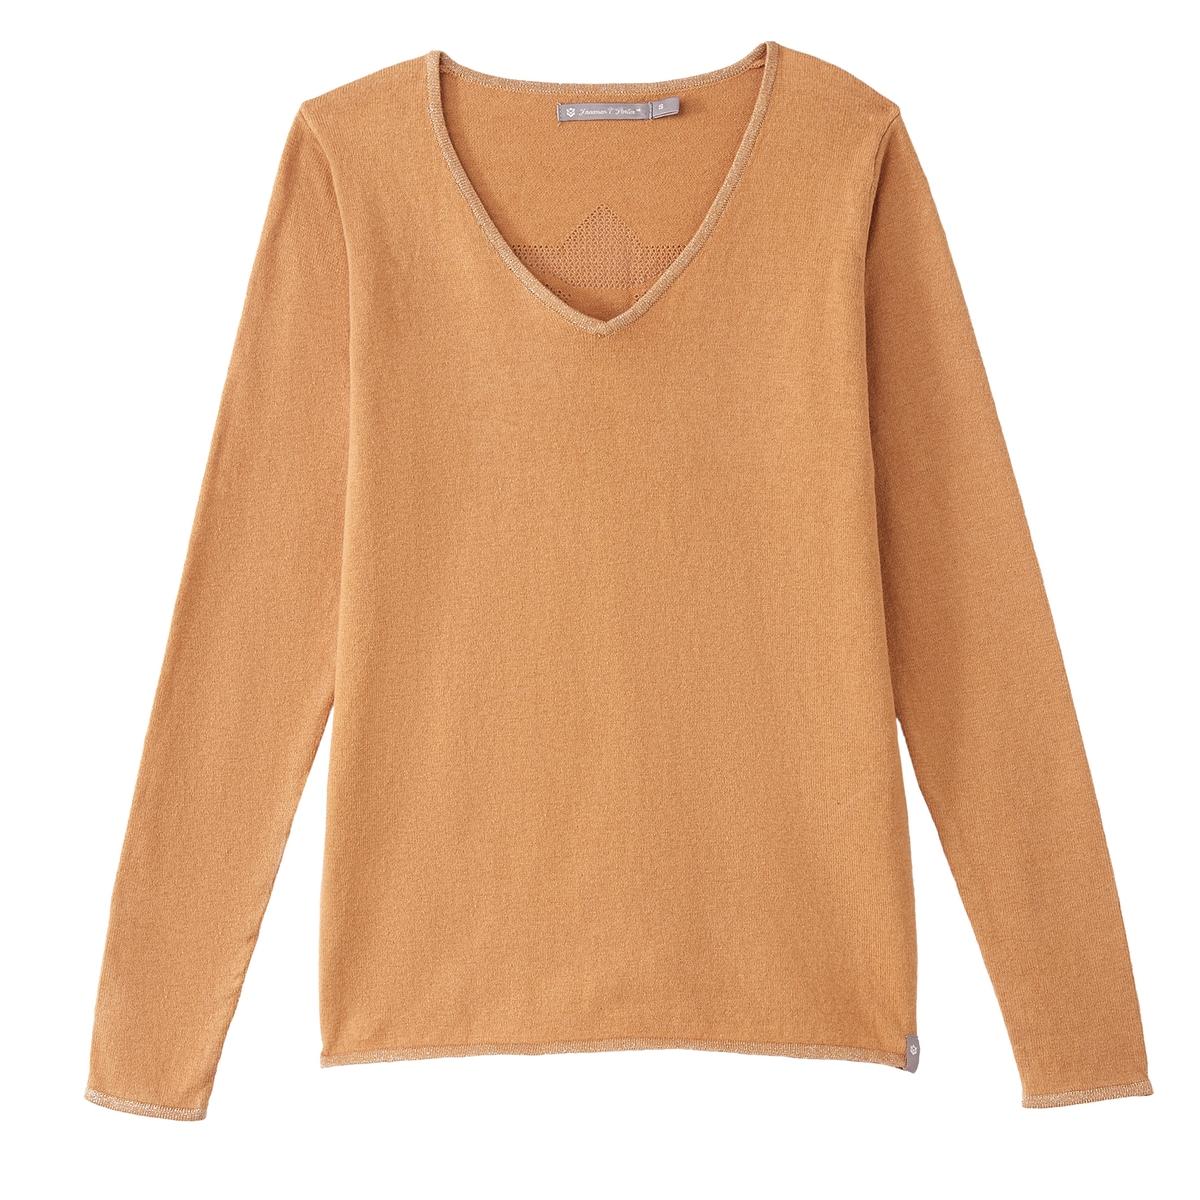 Пуловер FREEMAN T. PORTER 15521760 от LaRedoute